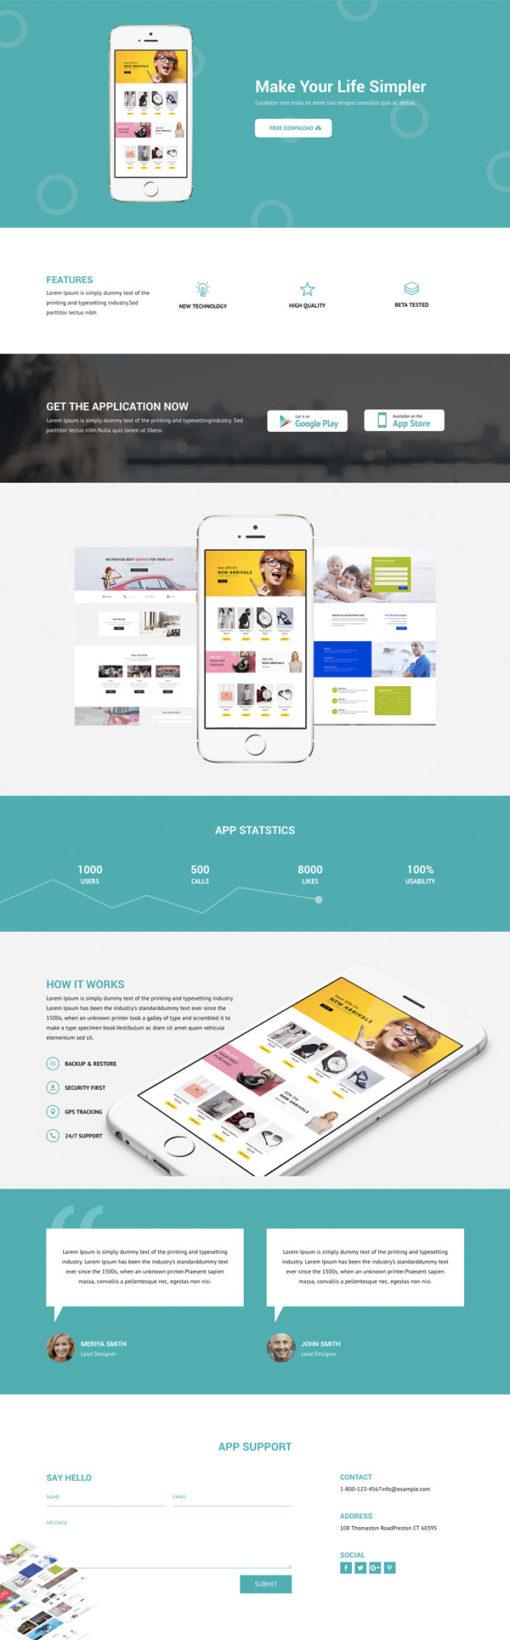 Divi layout for mobile app